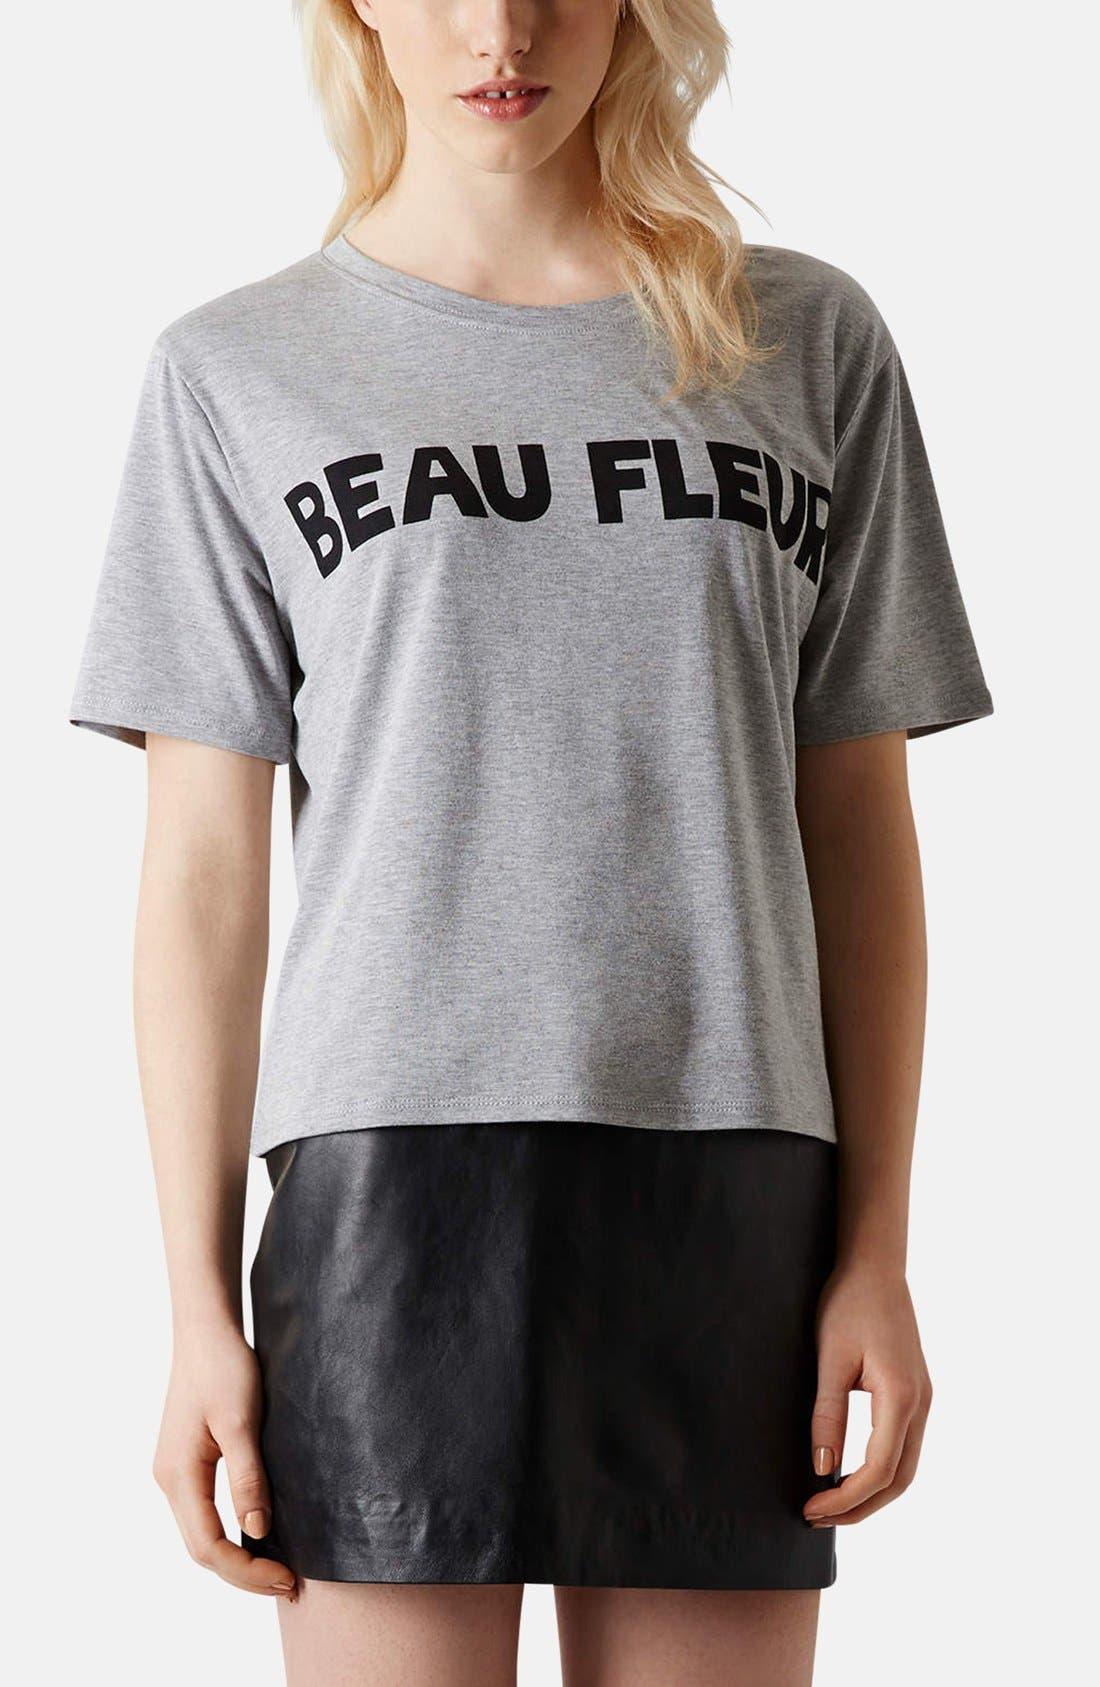 Alternate Image 1 Selected - Topshop 'Beau Fleur' Graphic Tee